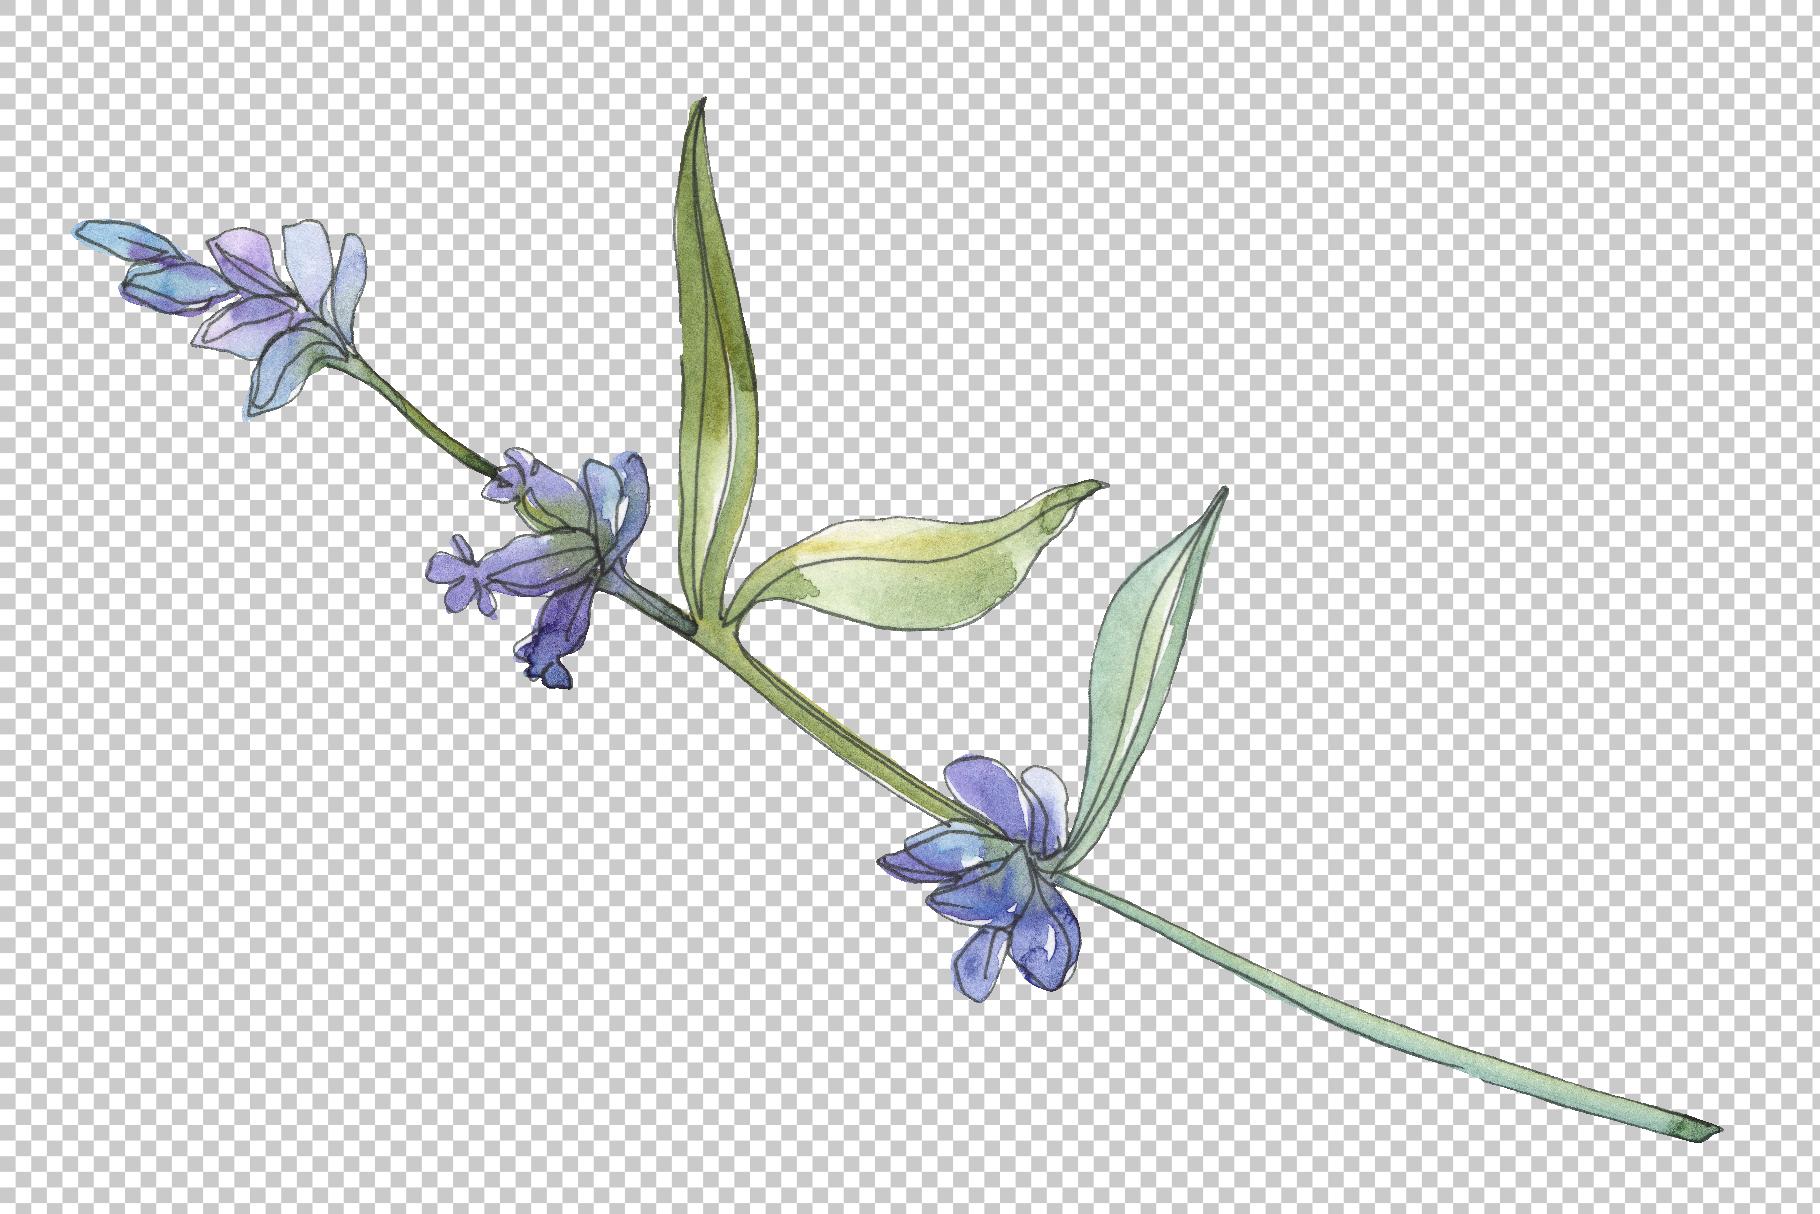 Bouquet summer breeze lavender watercolor png example image 7